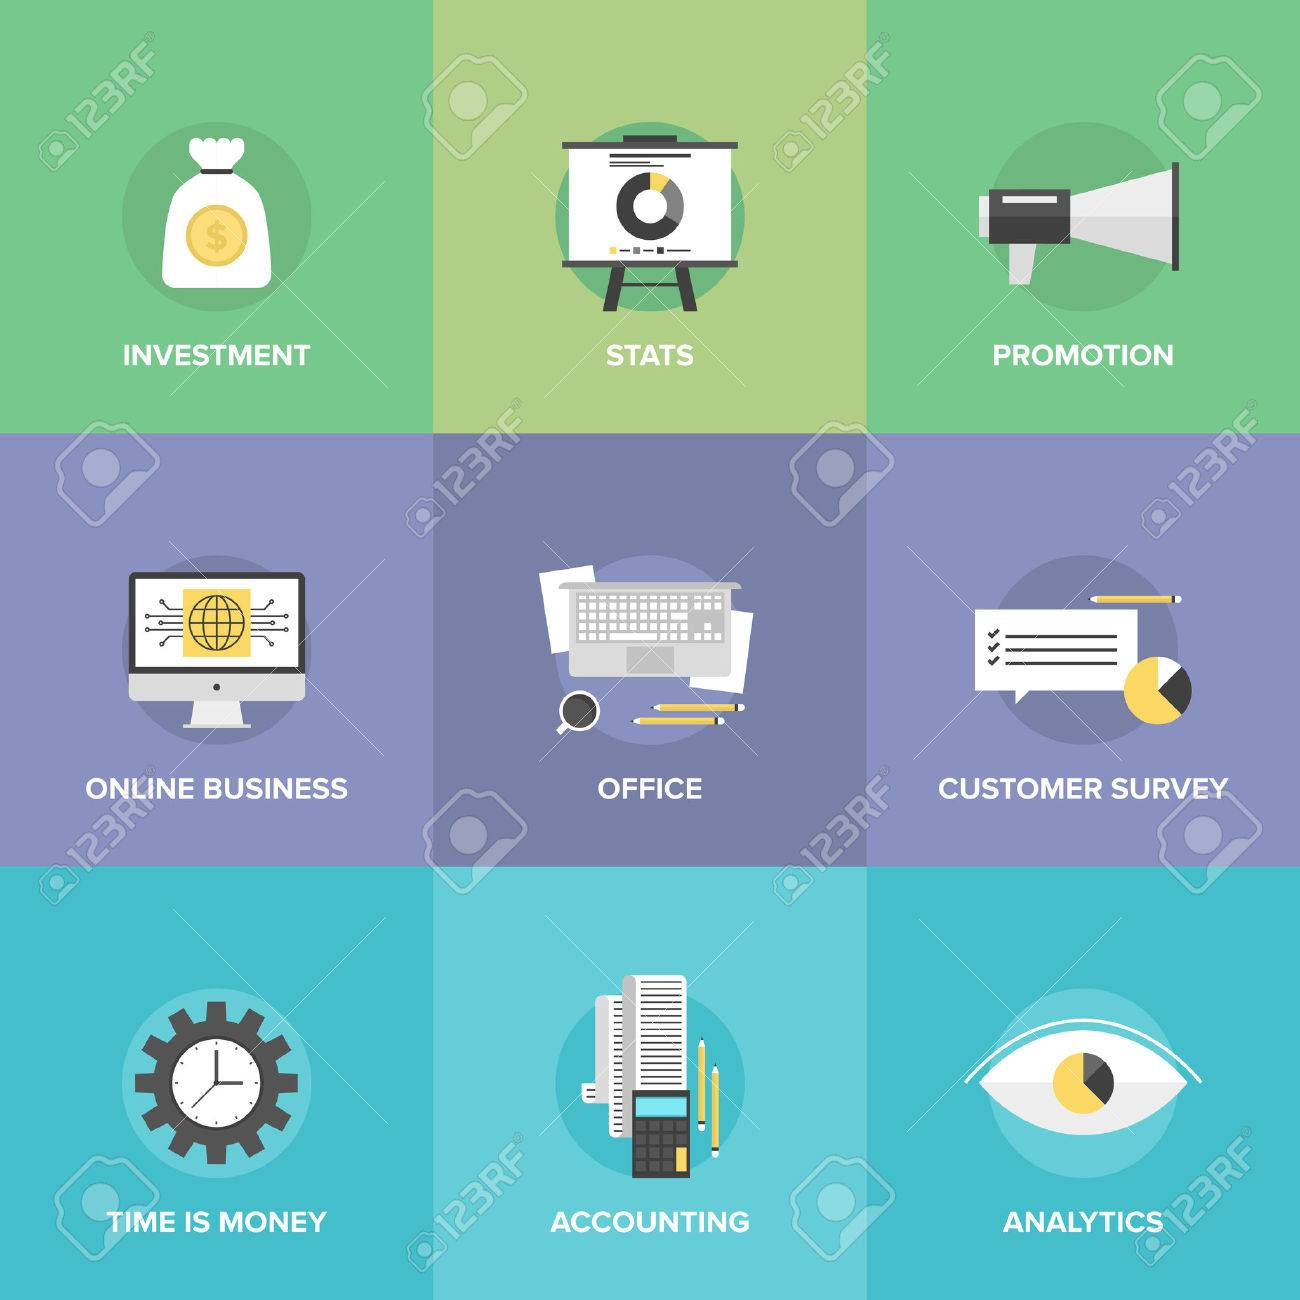 customer survey the office